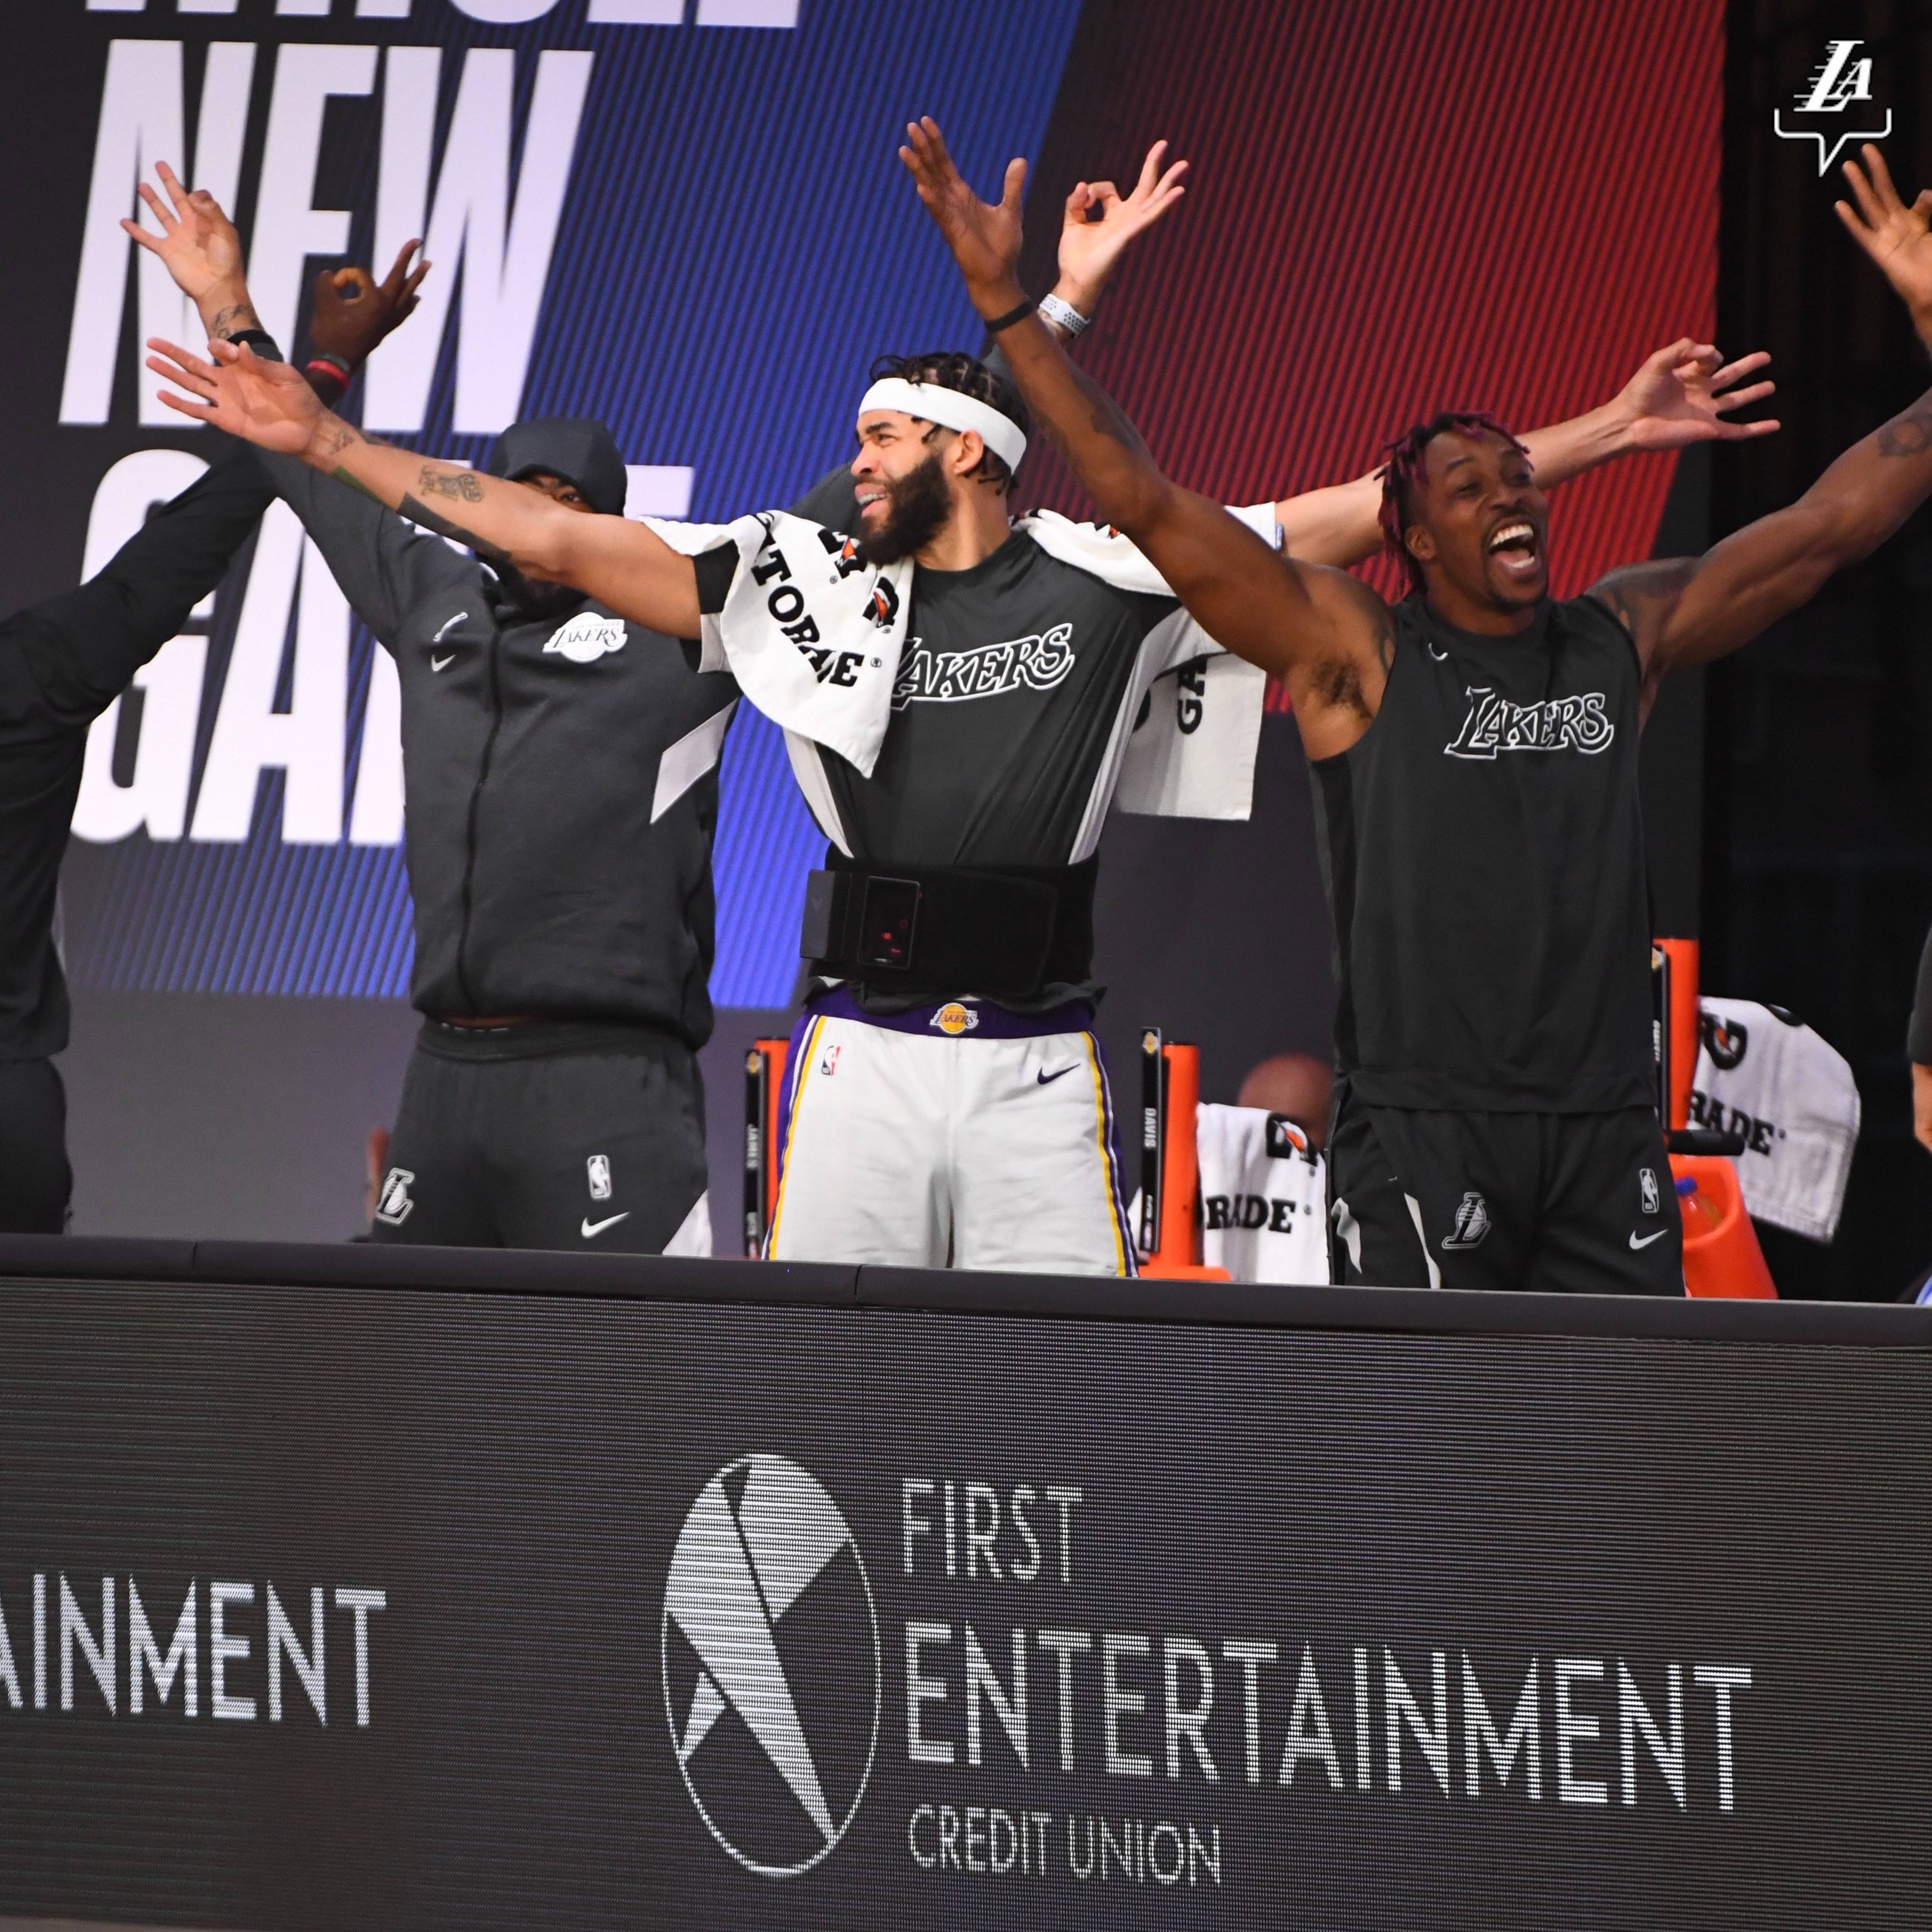 NBA复工前热身赛观察报告 隔离泡泡惊喜与警报并存